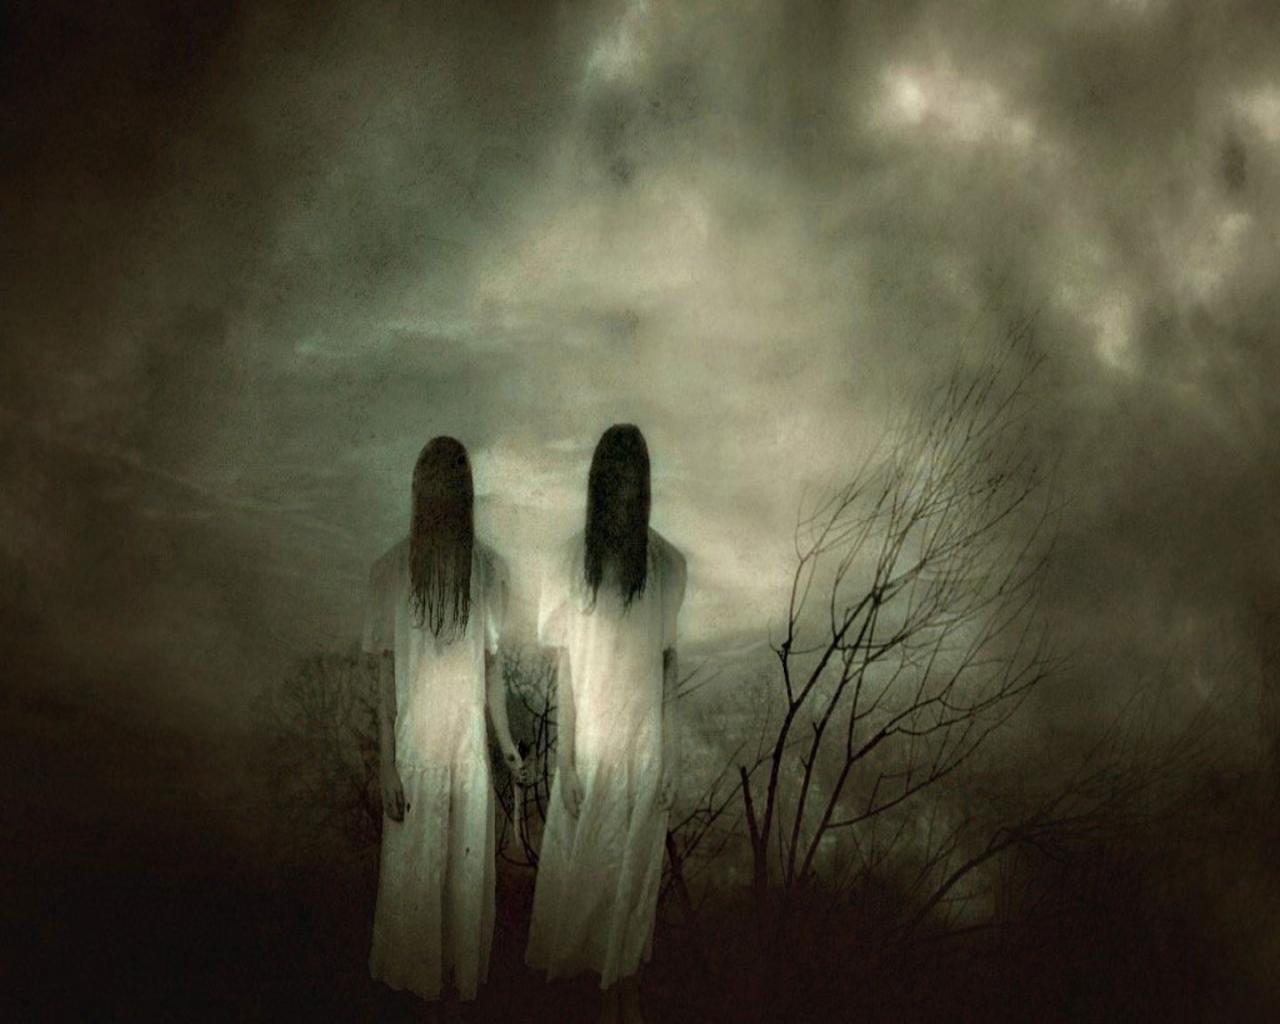 Scary Ghost Wallpapers - WallpaperSafari